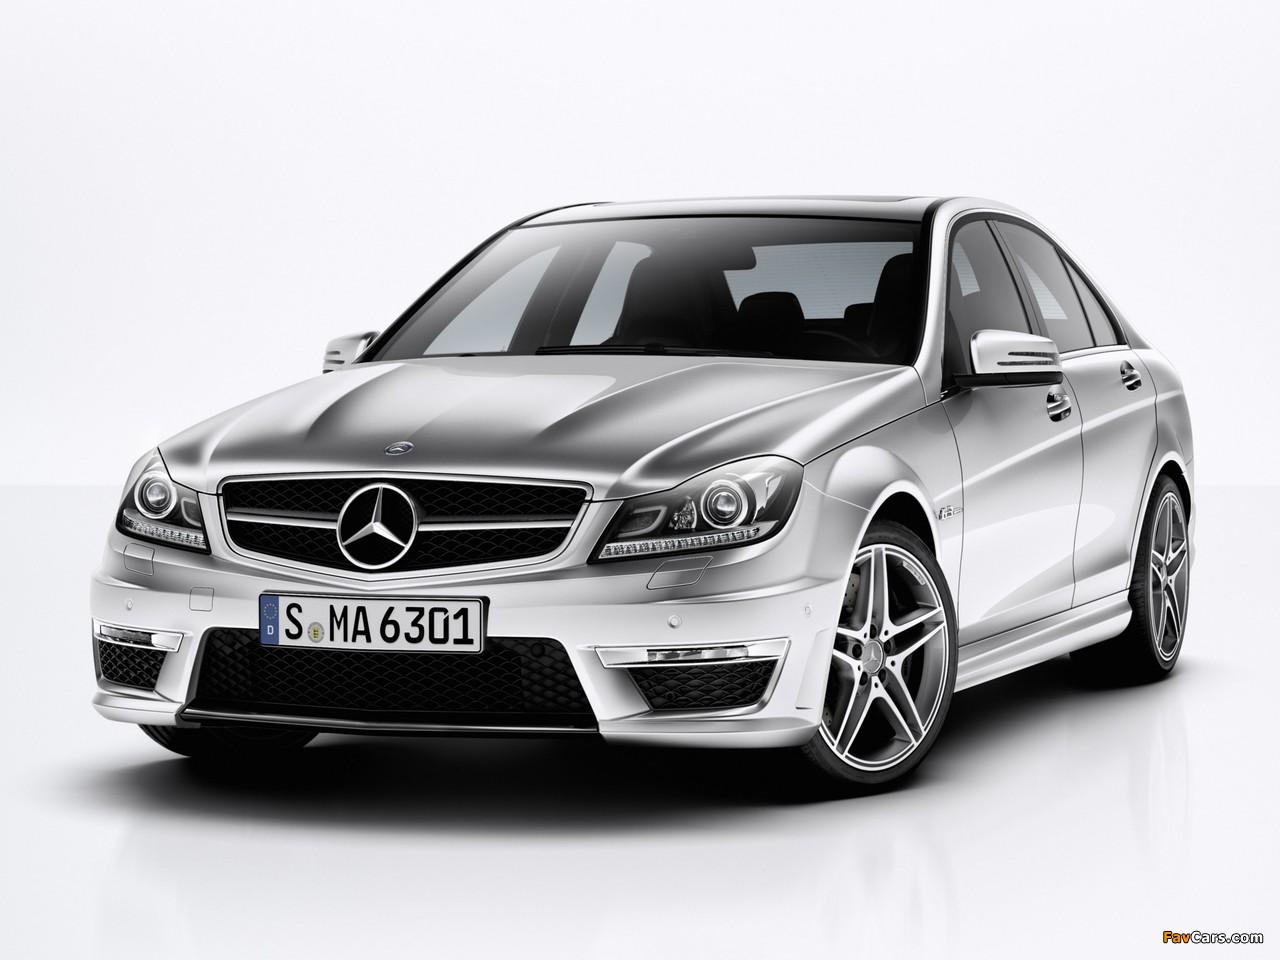 Mercedes-Benz C 63 AMG (W204) 2011 photos (1280 x 960)